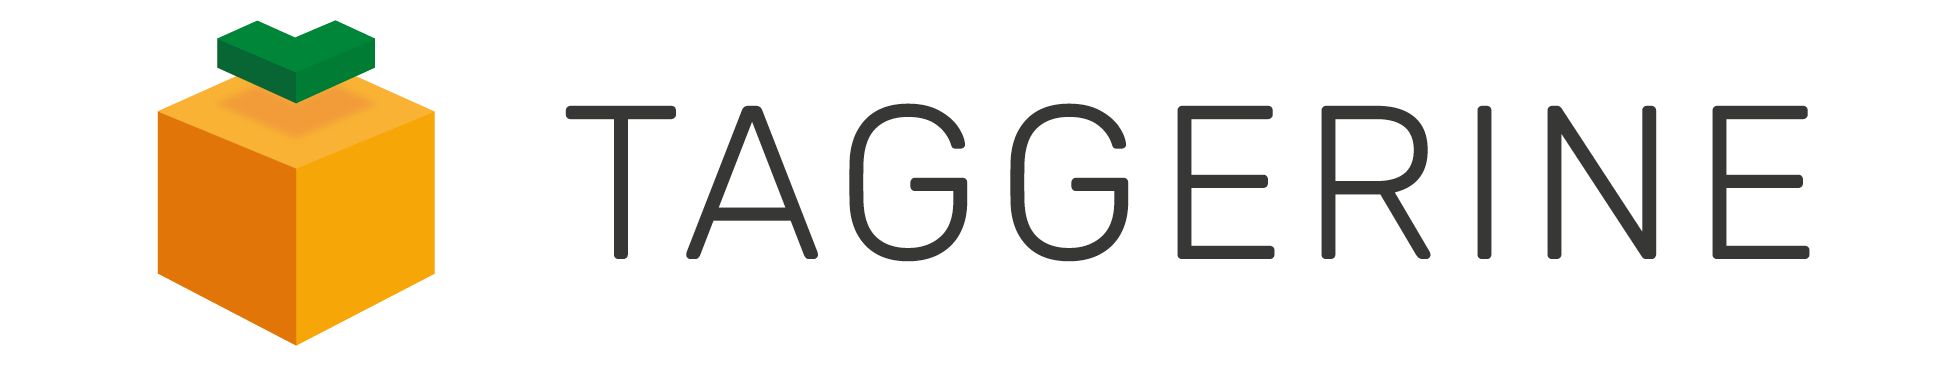 Taggerine Logo